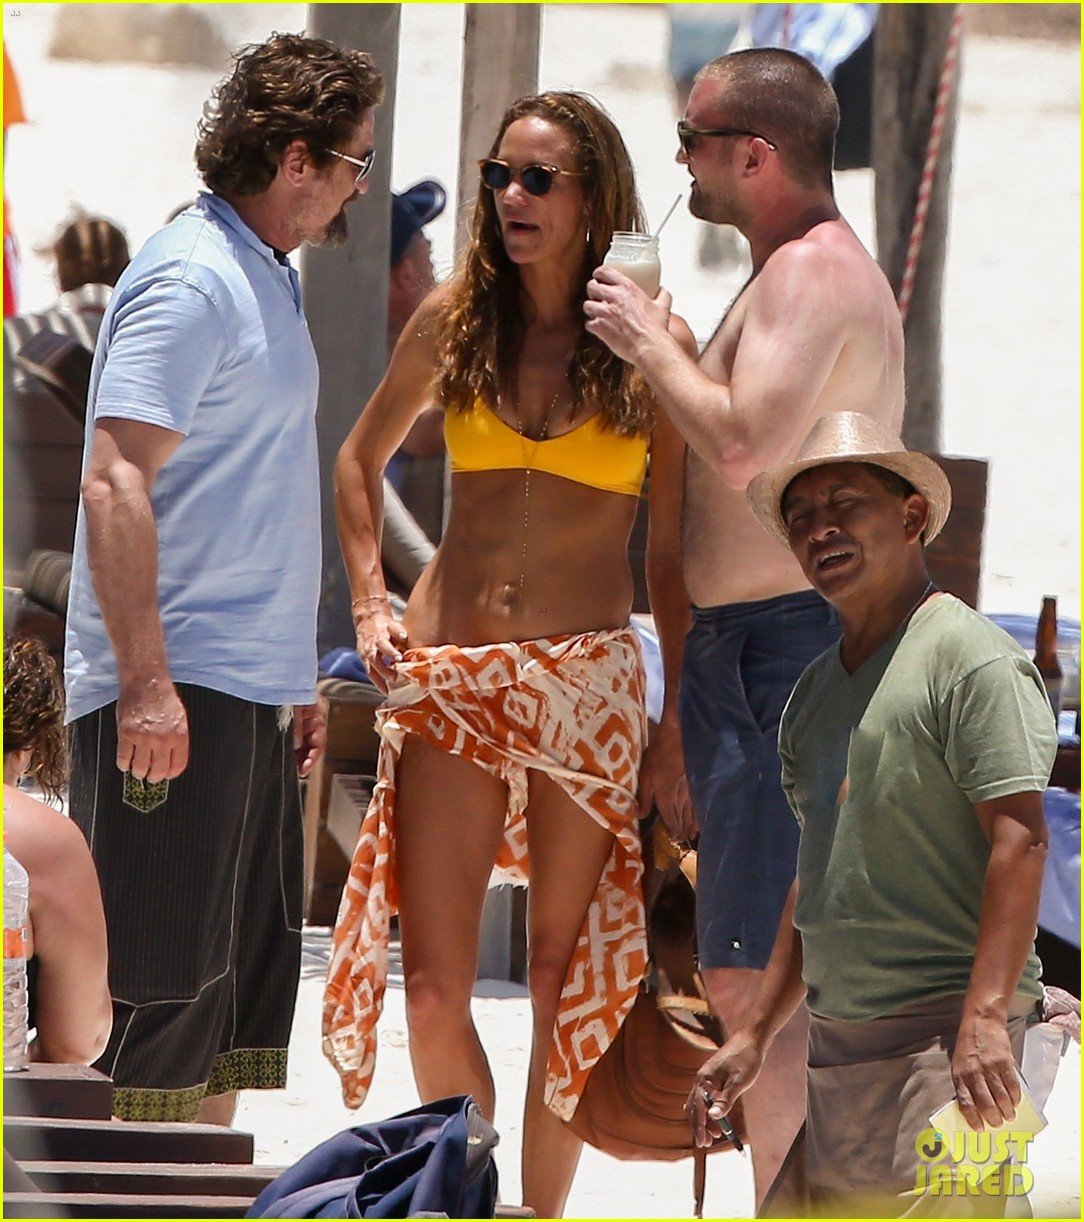 gerard butler on again gf hit the beach in mexico31